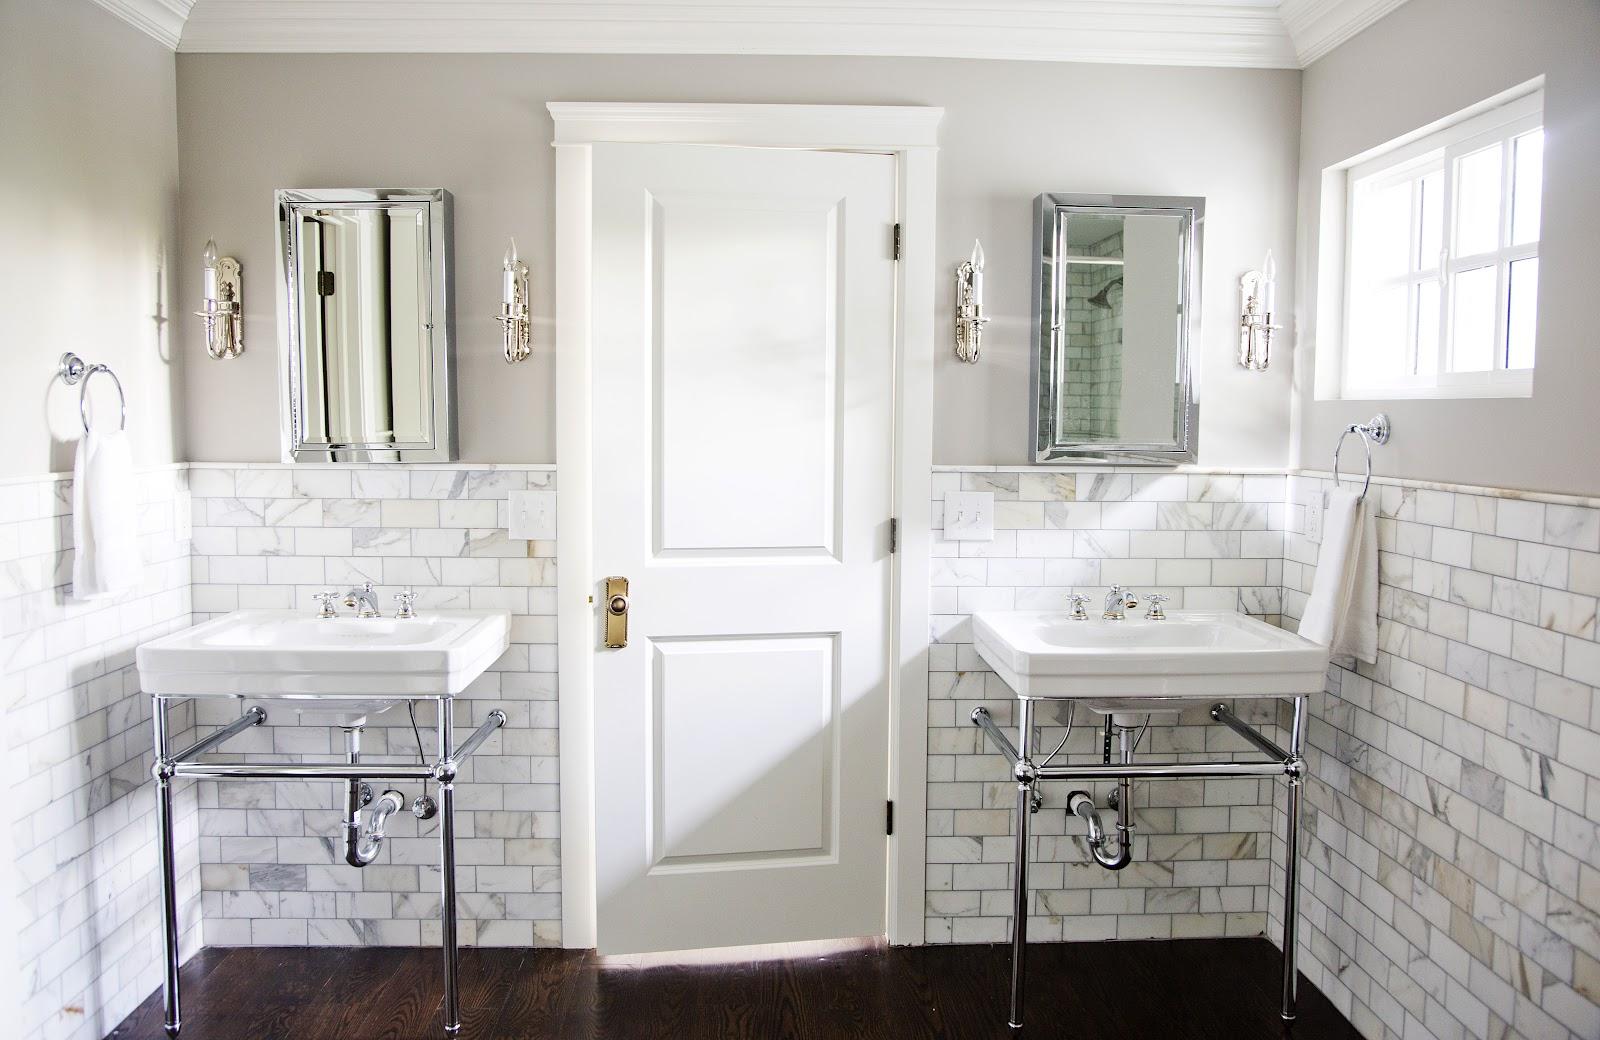 http://2.bp.blogspot.com/-It1_cWTvvkw/T9ISFeCFy5I/AAAAAAAAA00/TP0T1ueWfjg/s1600/emilybrownpaography_masterbathroom.jpg